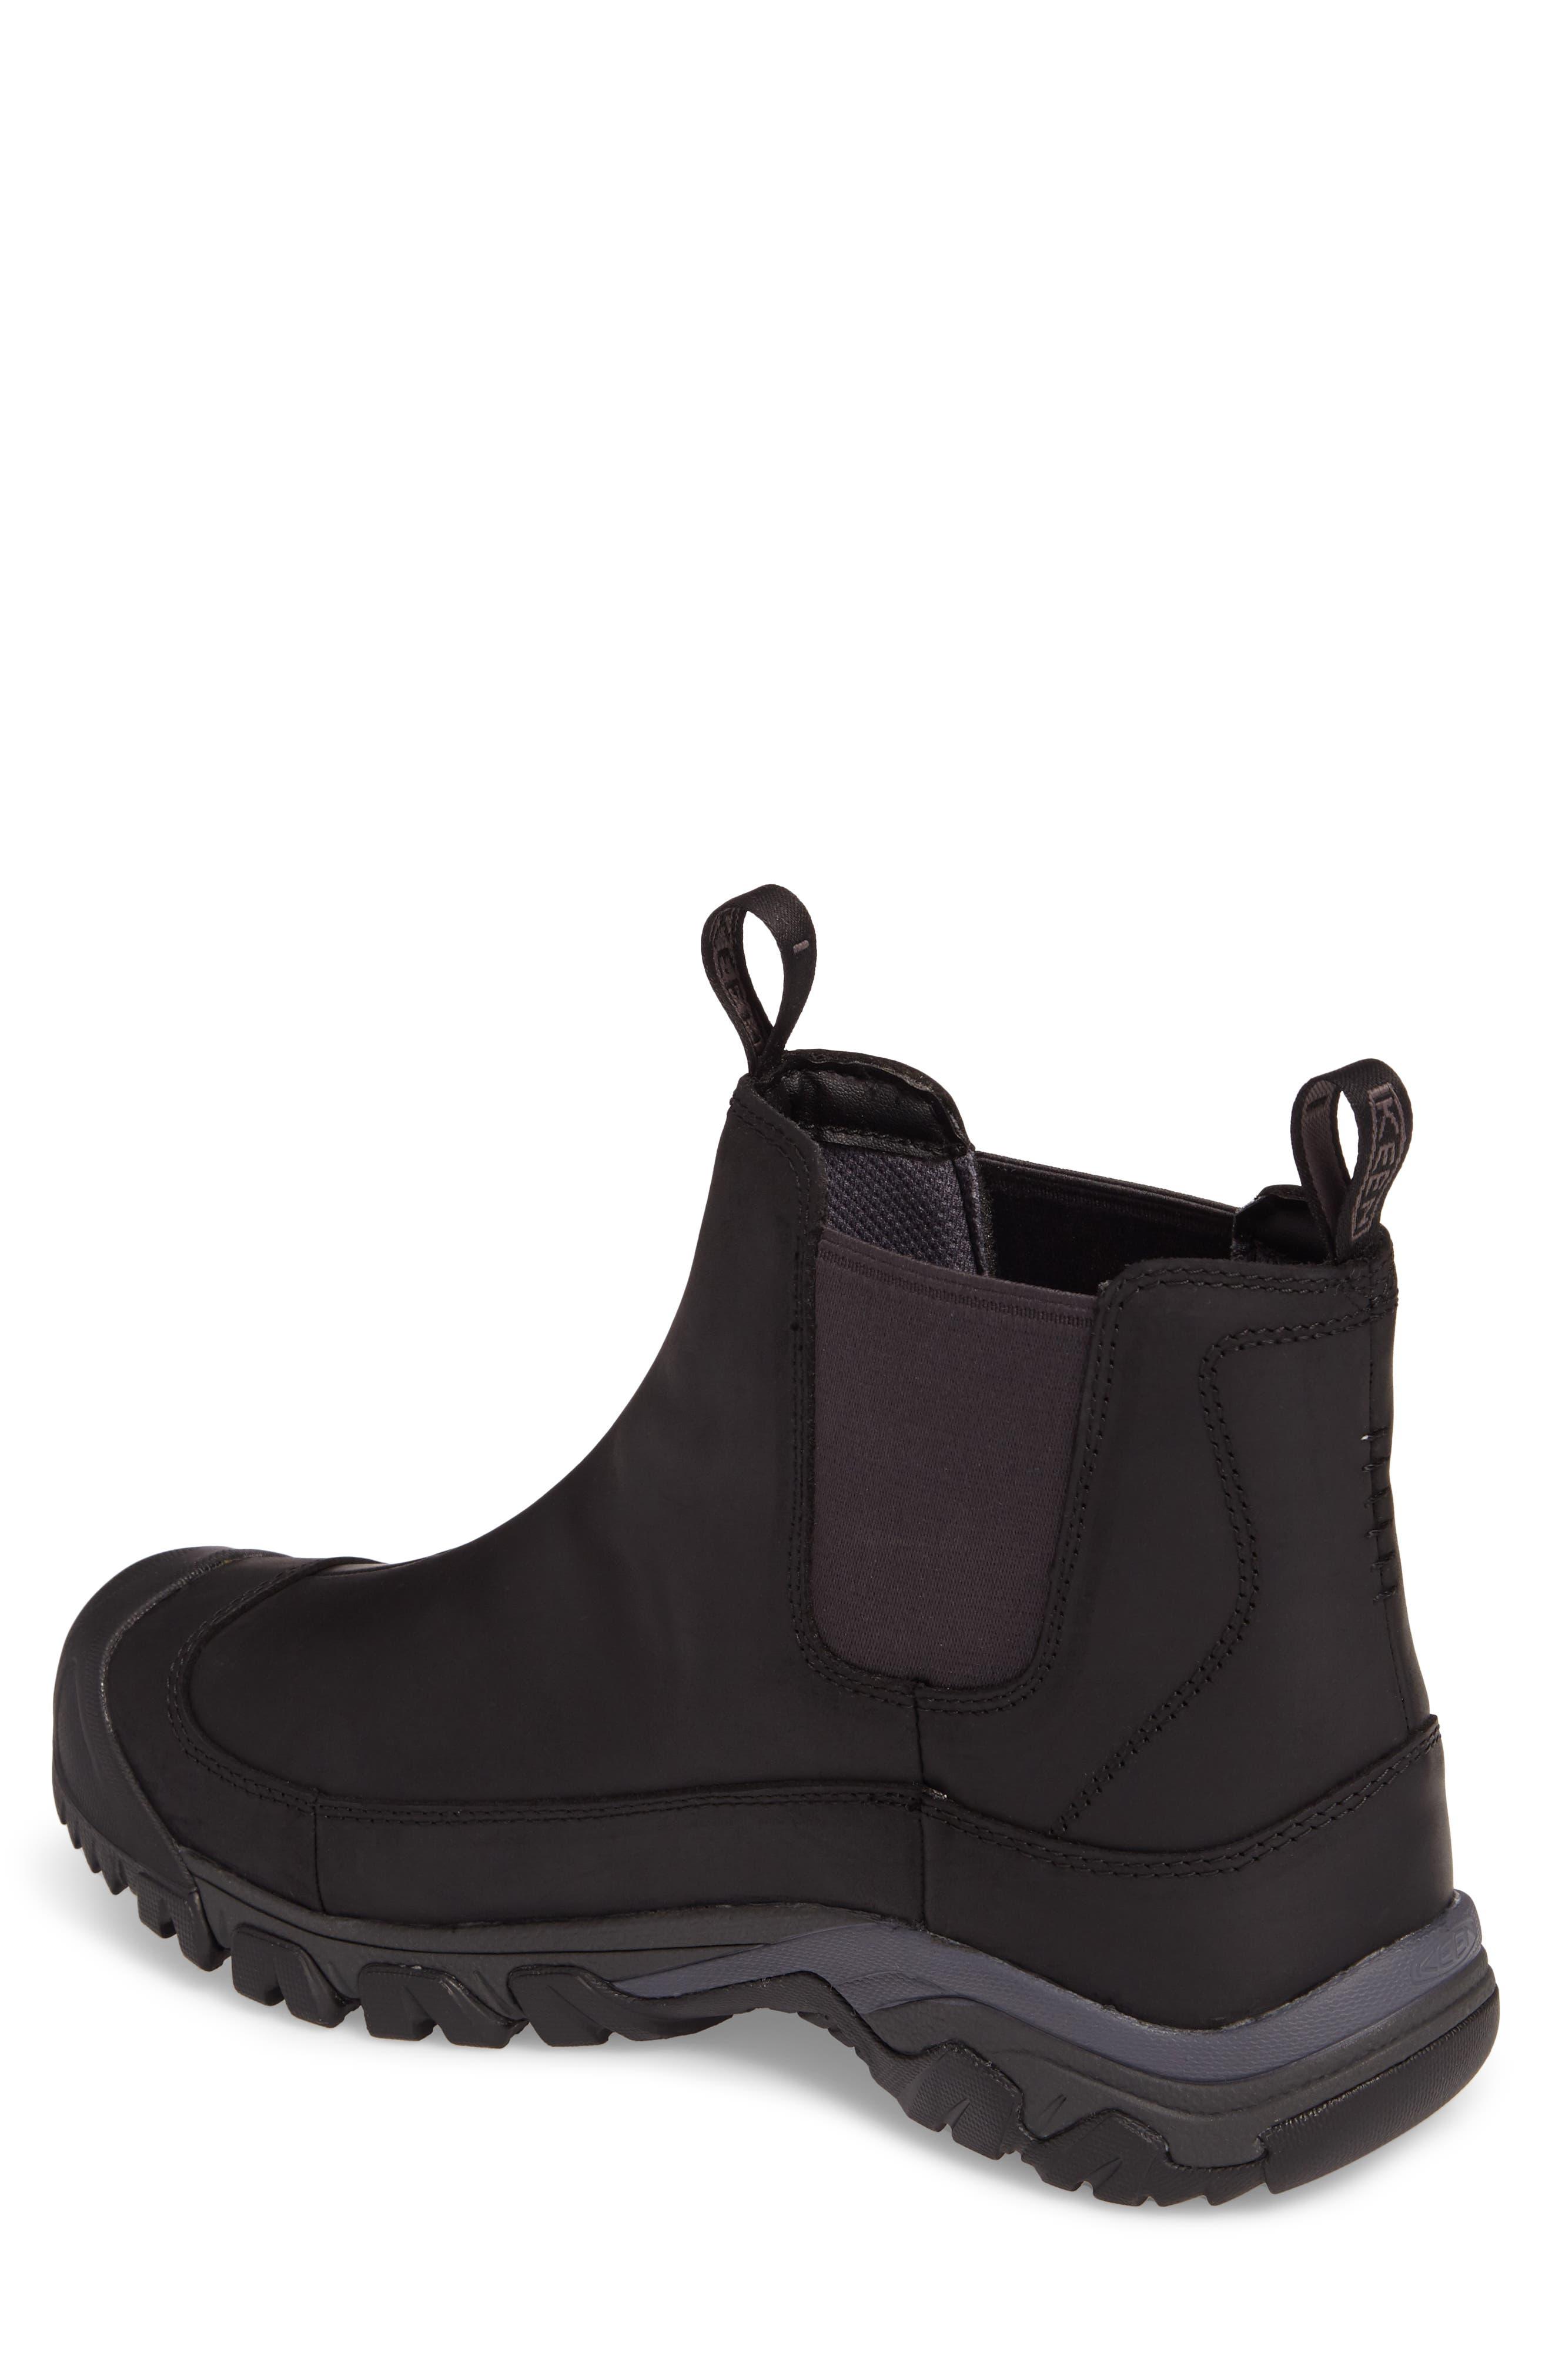 KEEN, Anchorage II Waterproof Chelsea Boot, Alternate thumbnail 2, color, 001